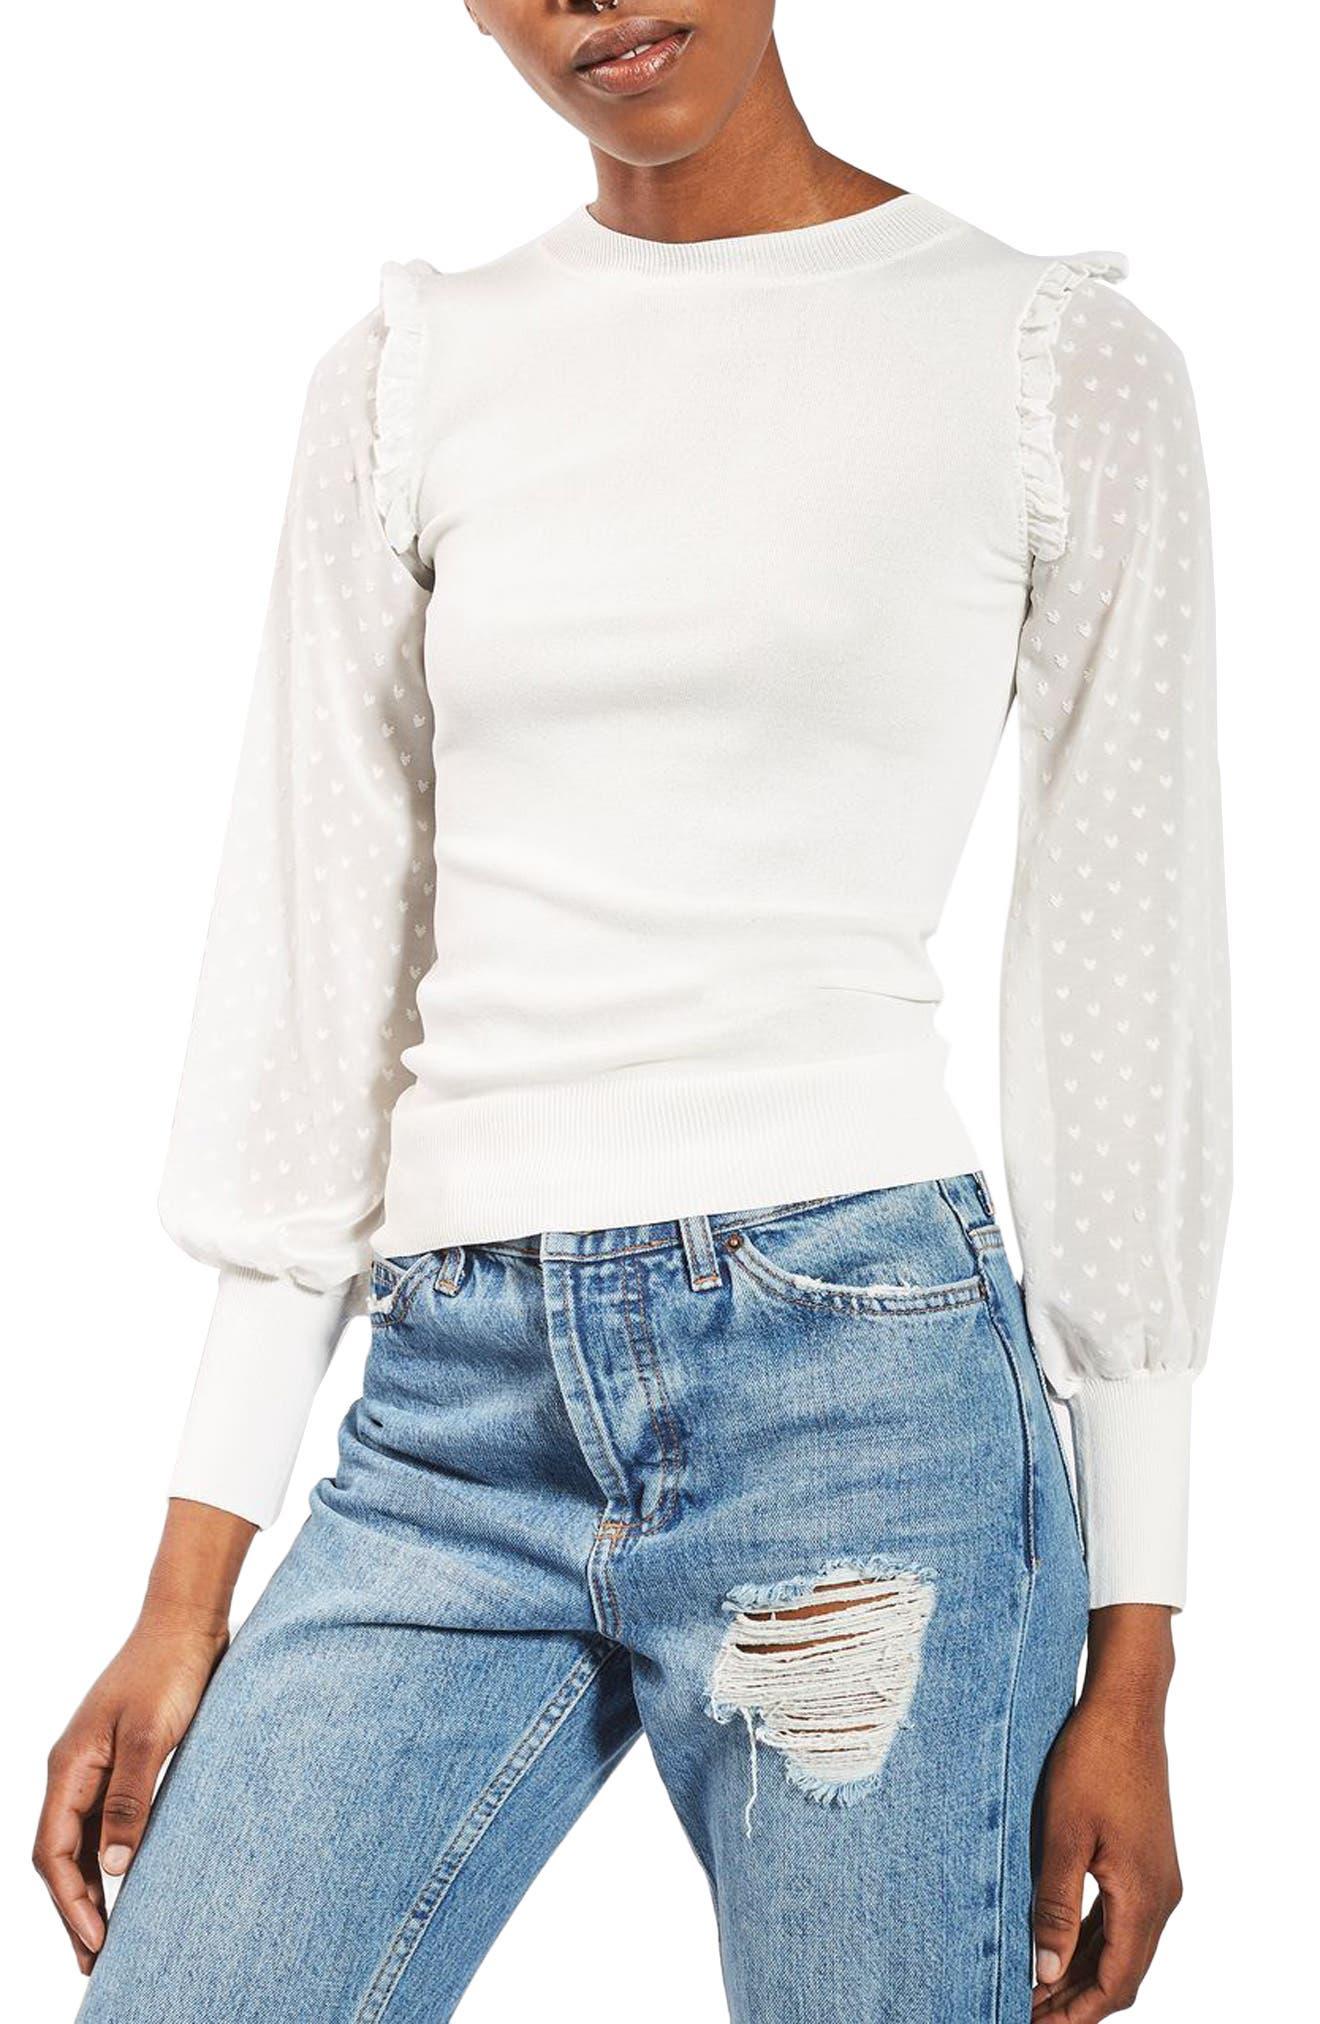 Alternate Image 1 Selected - Topshop Chiffon Sleeve Sweater